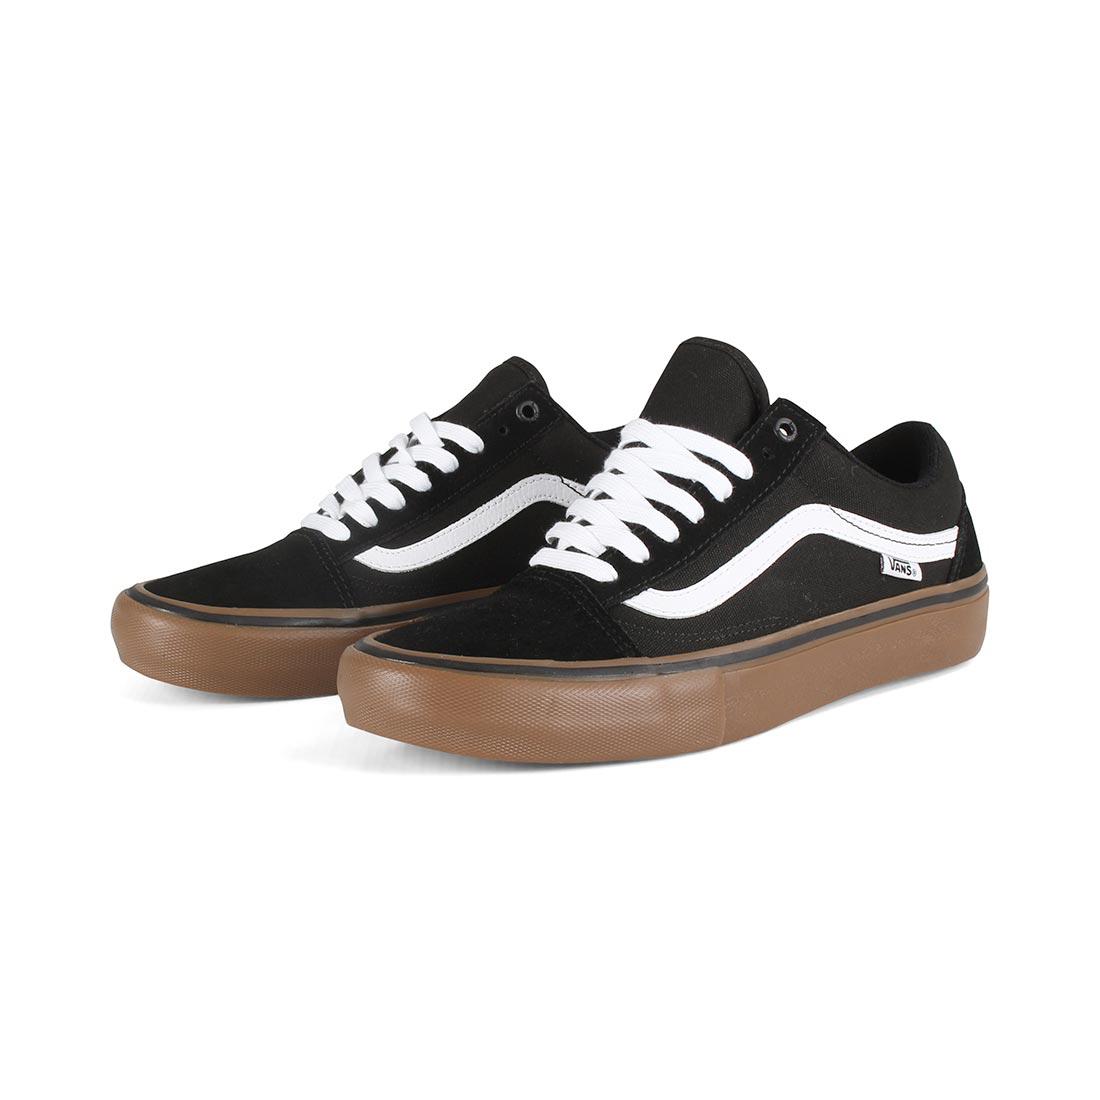 Vans Old Skool Pro Skate Shoes - Black   White   Medium Gum abdbd2039